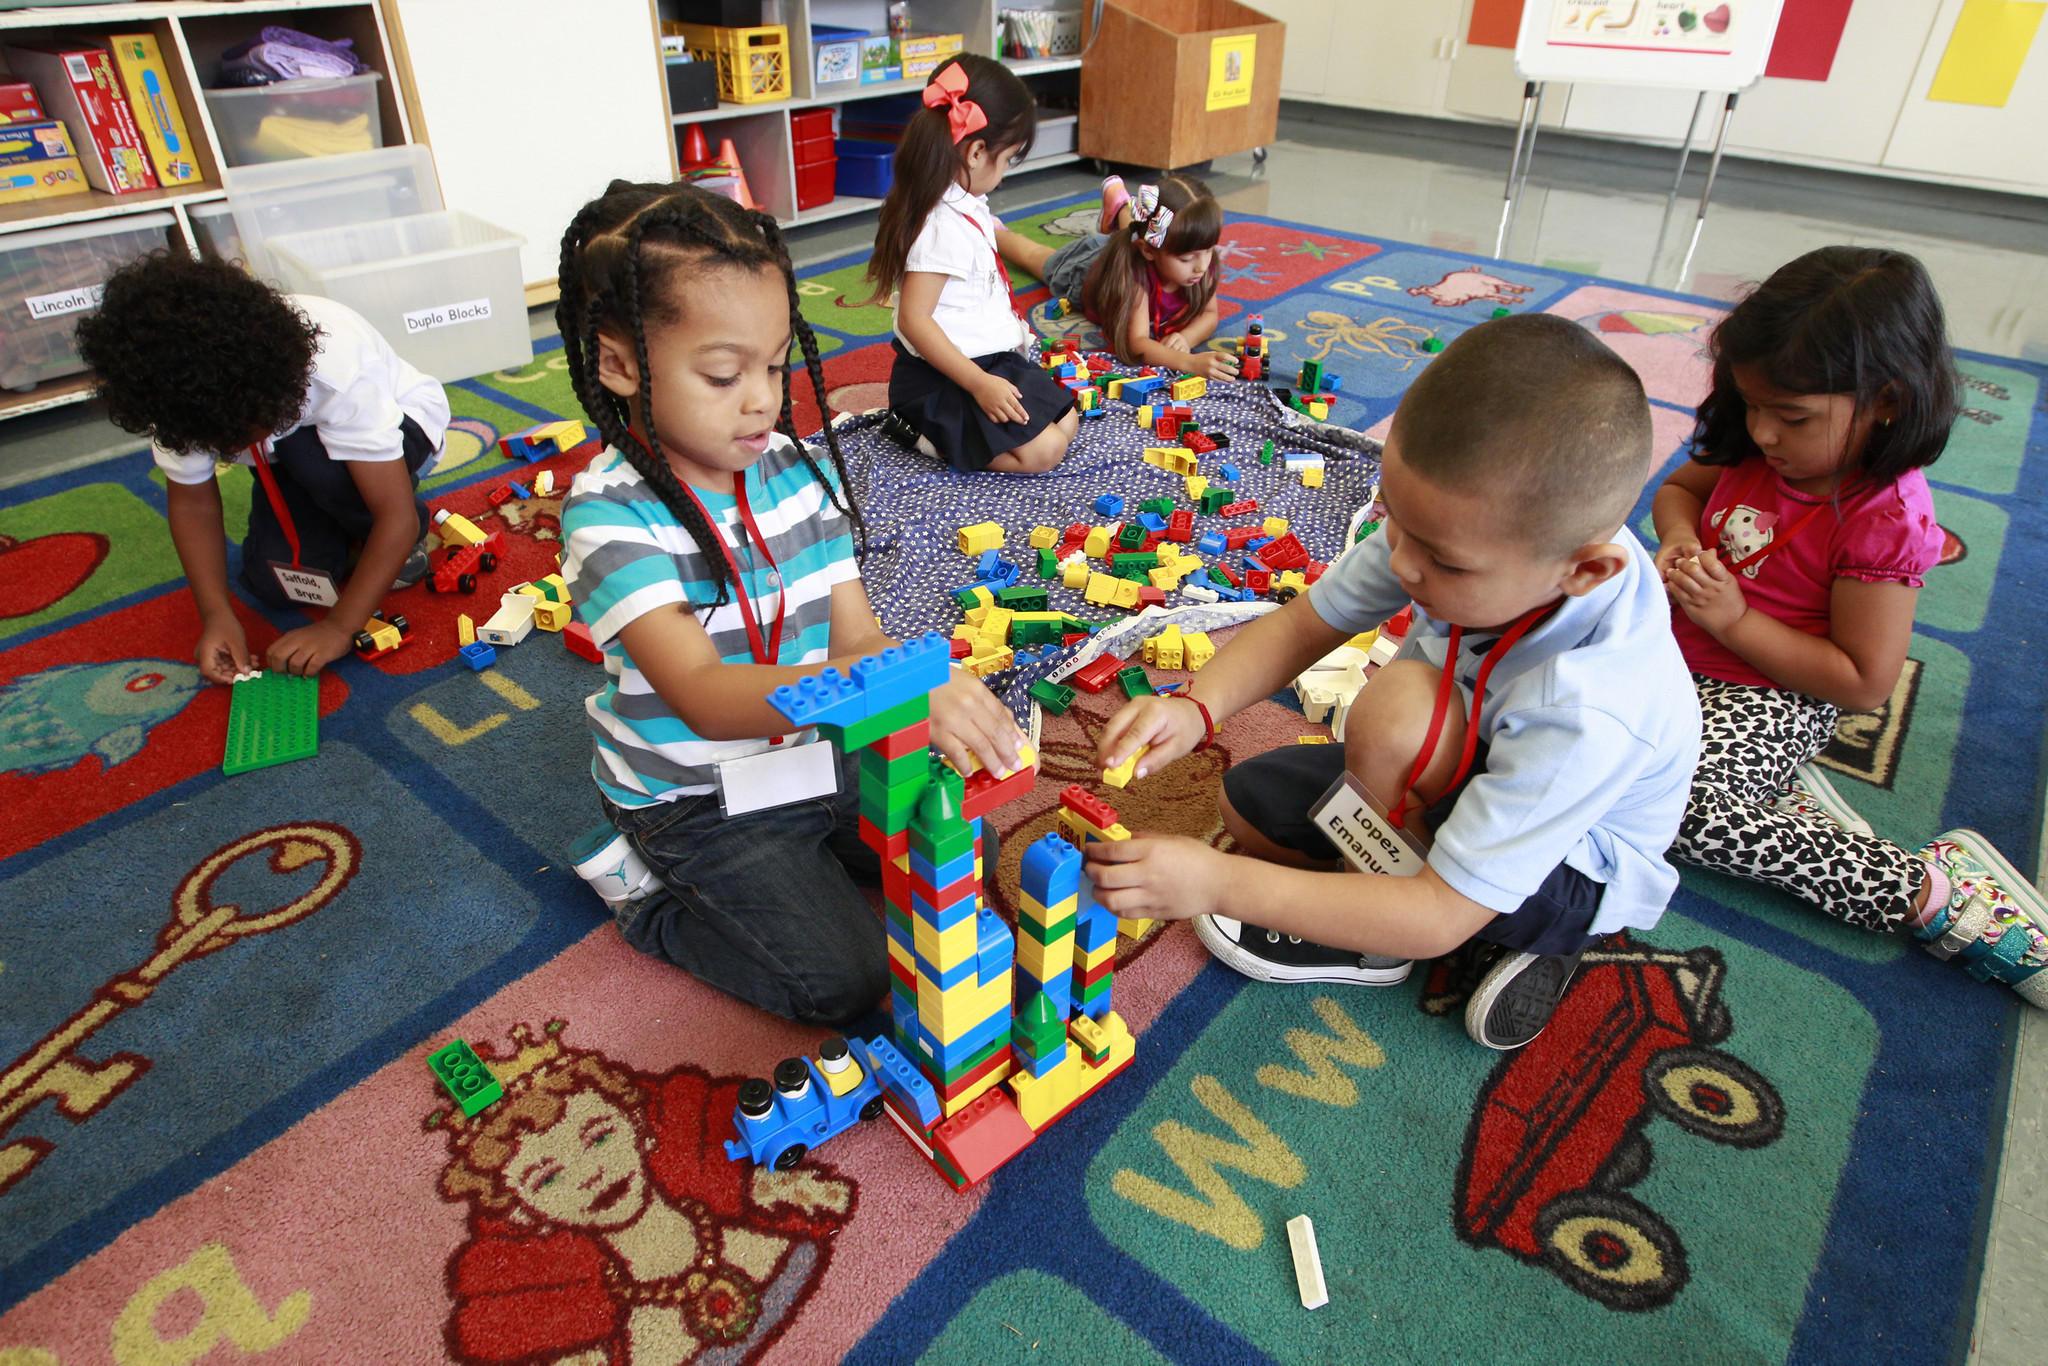 preschool learning alliance training the plan to get every california kid into preschool la times 216